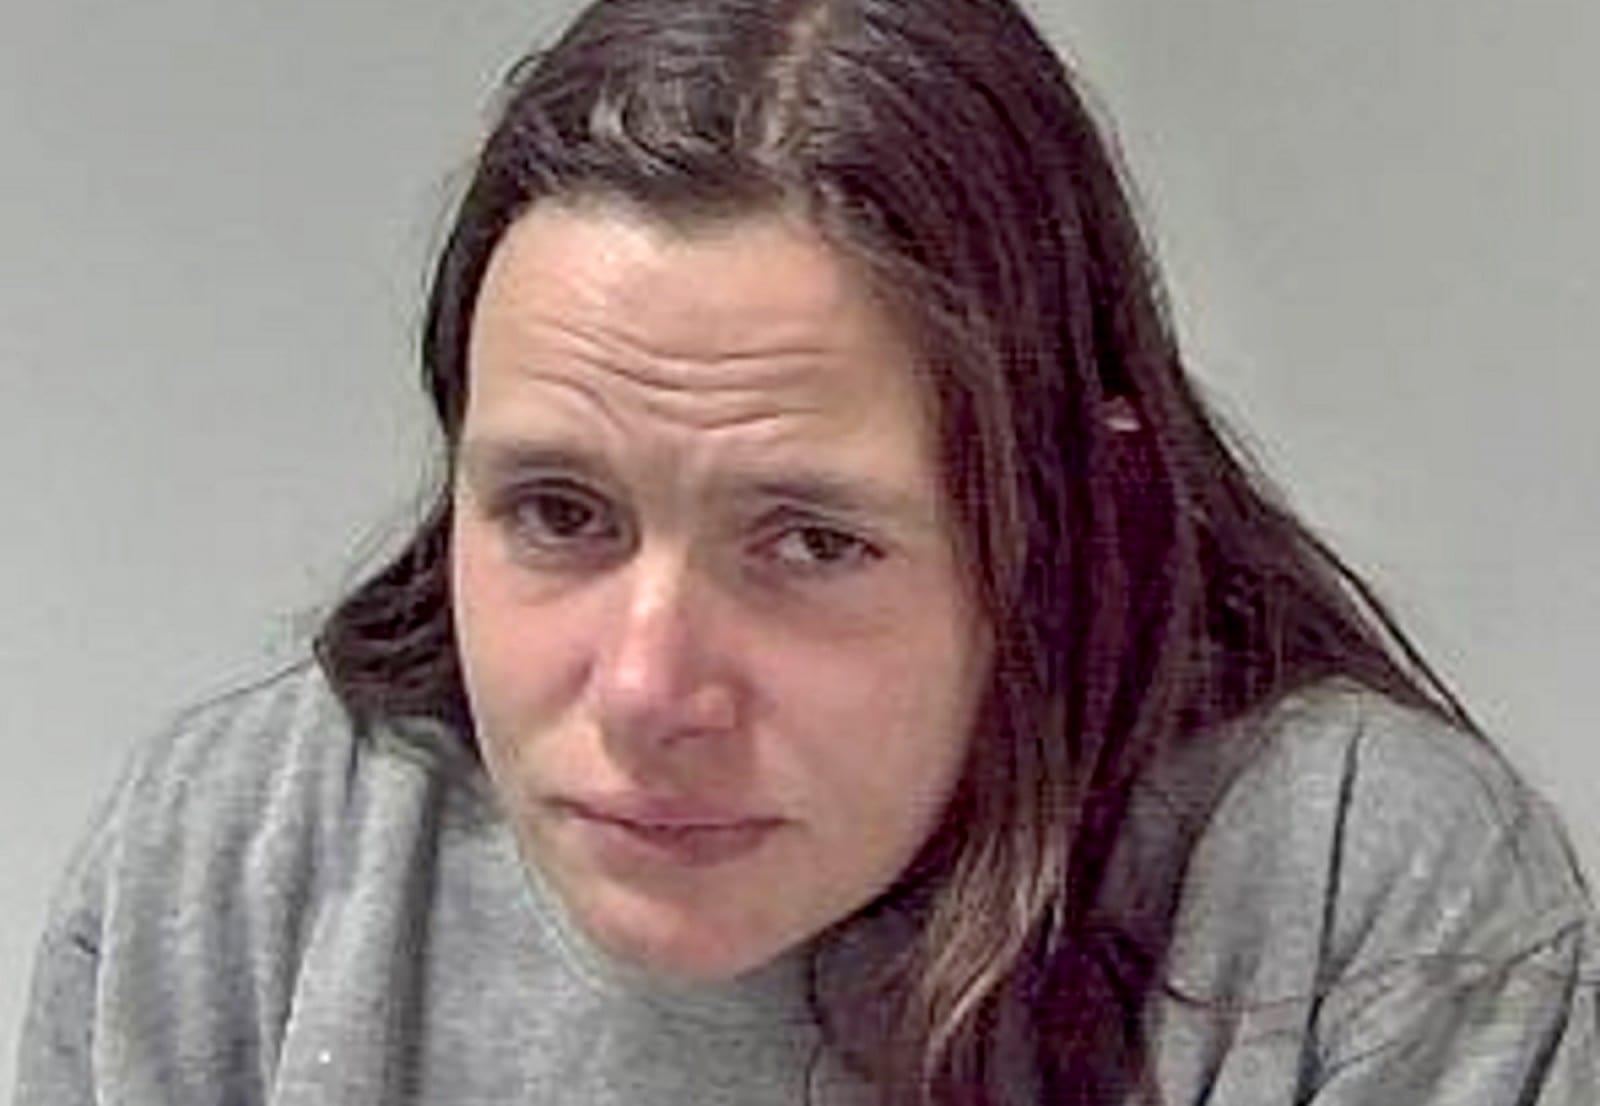 Female Burglar With Breast Cancer Jailed Despite Begging Judge For Mercy